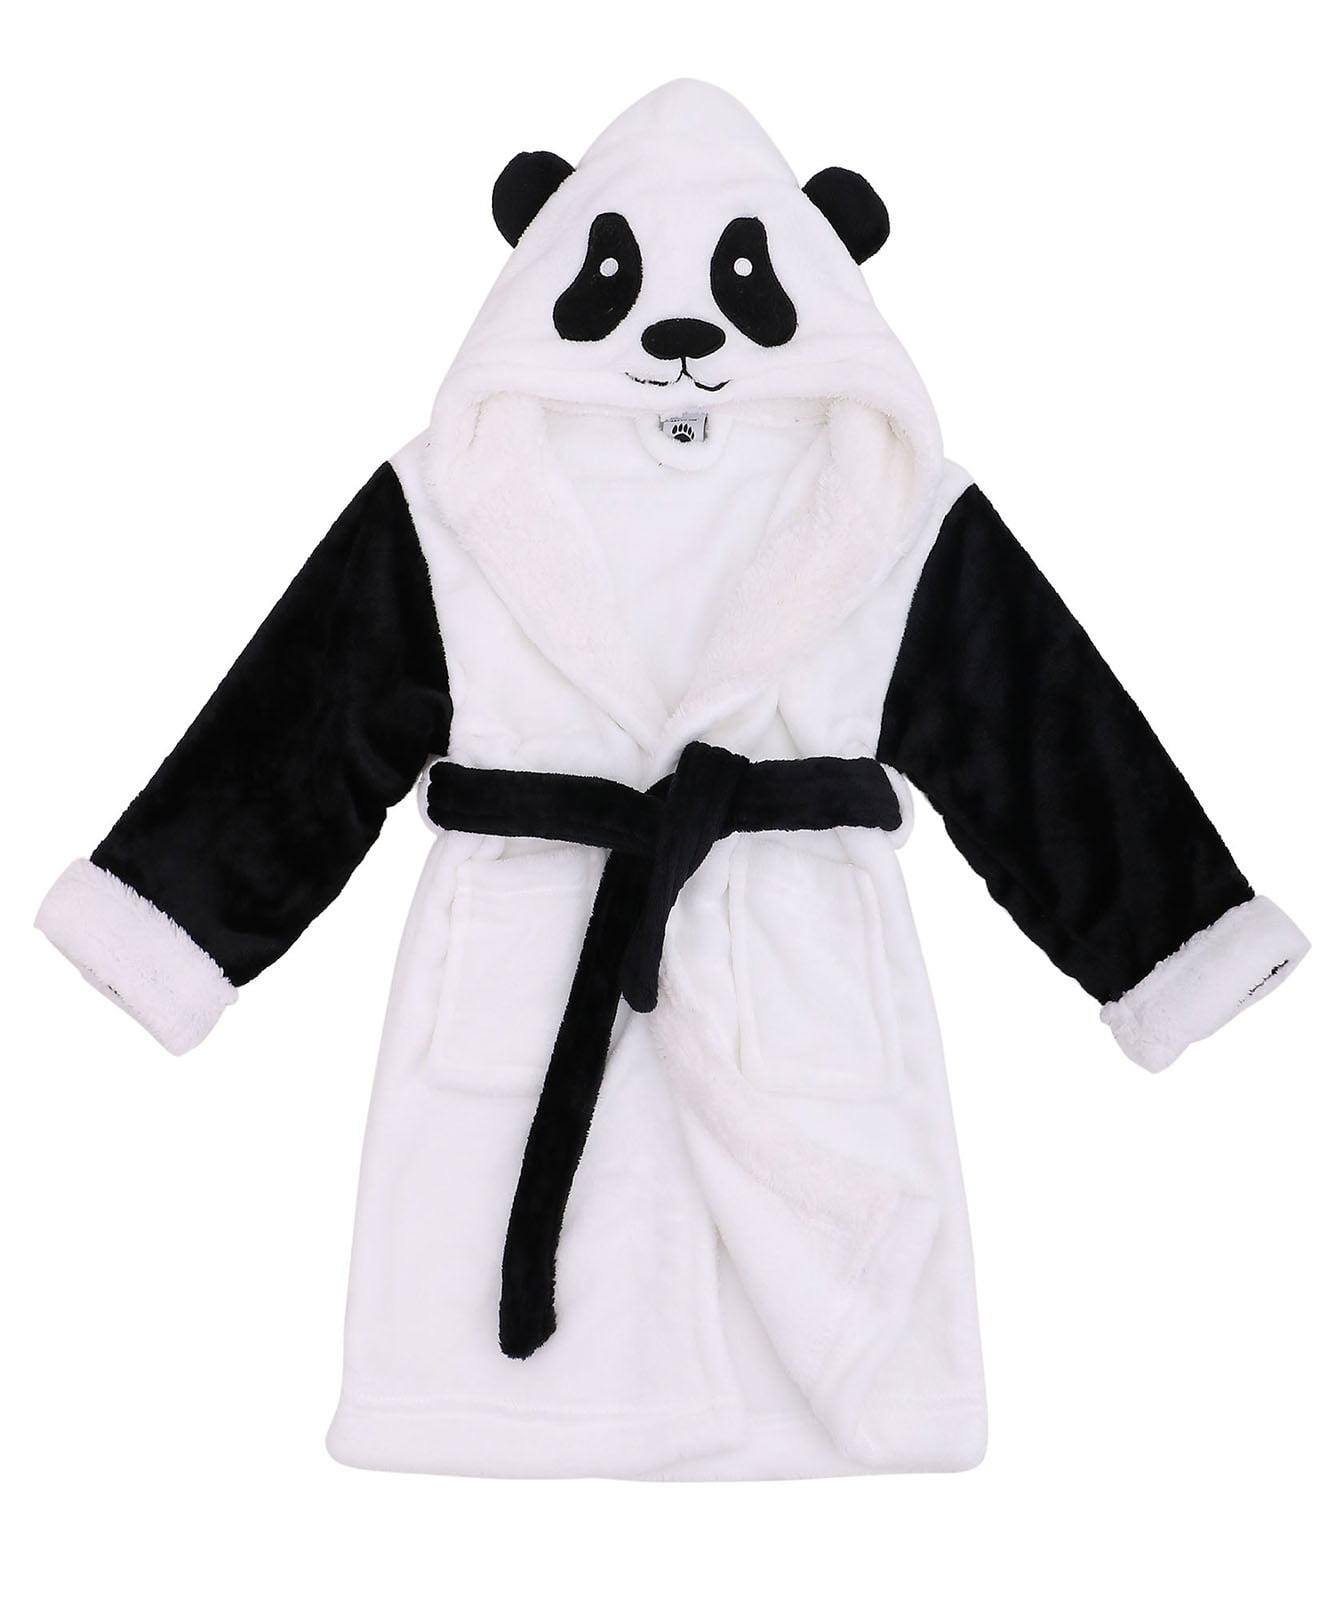 Baby Kids Hooded Pajamas Kigurumi Cosplay Costume Animal Home Bathrobe Robe